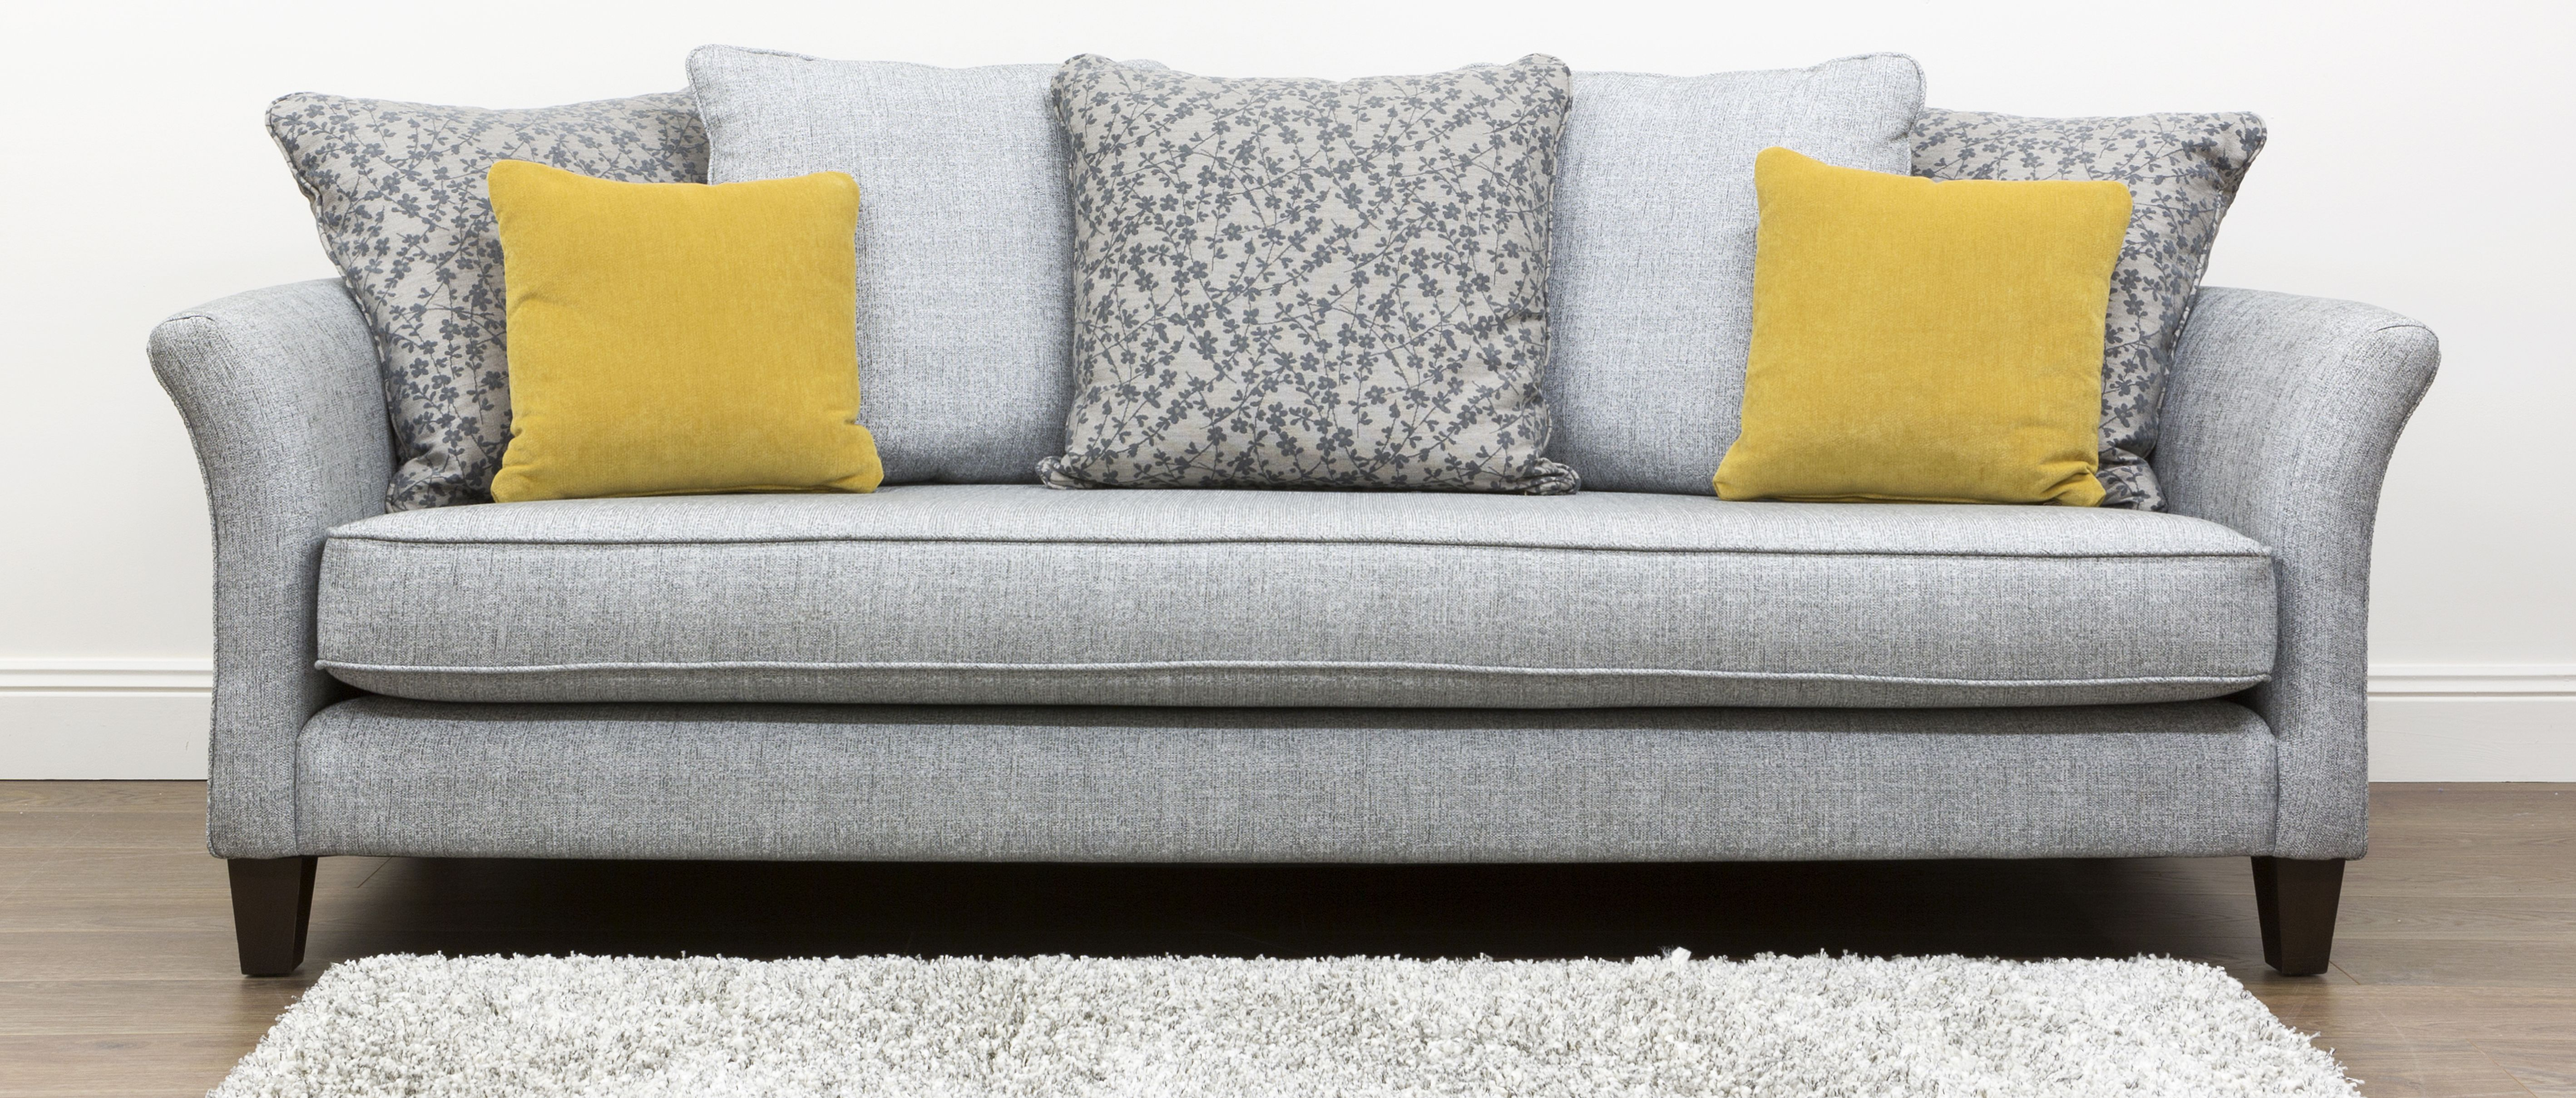 Elijah - Sofas and Chairs Range - Finline Furniture